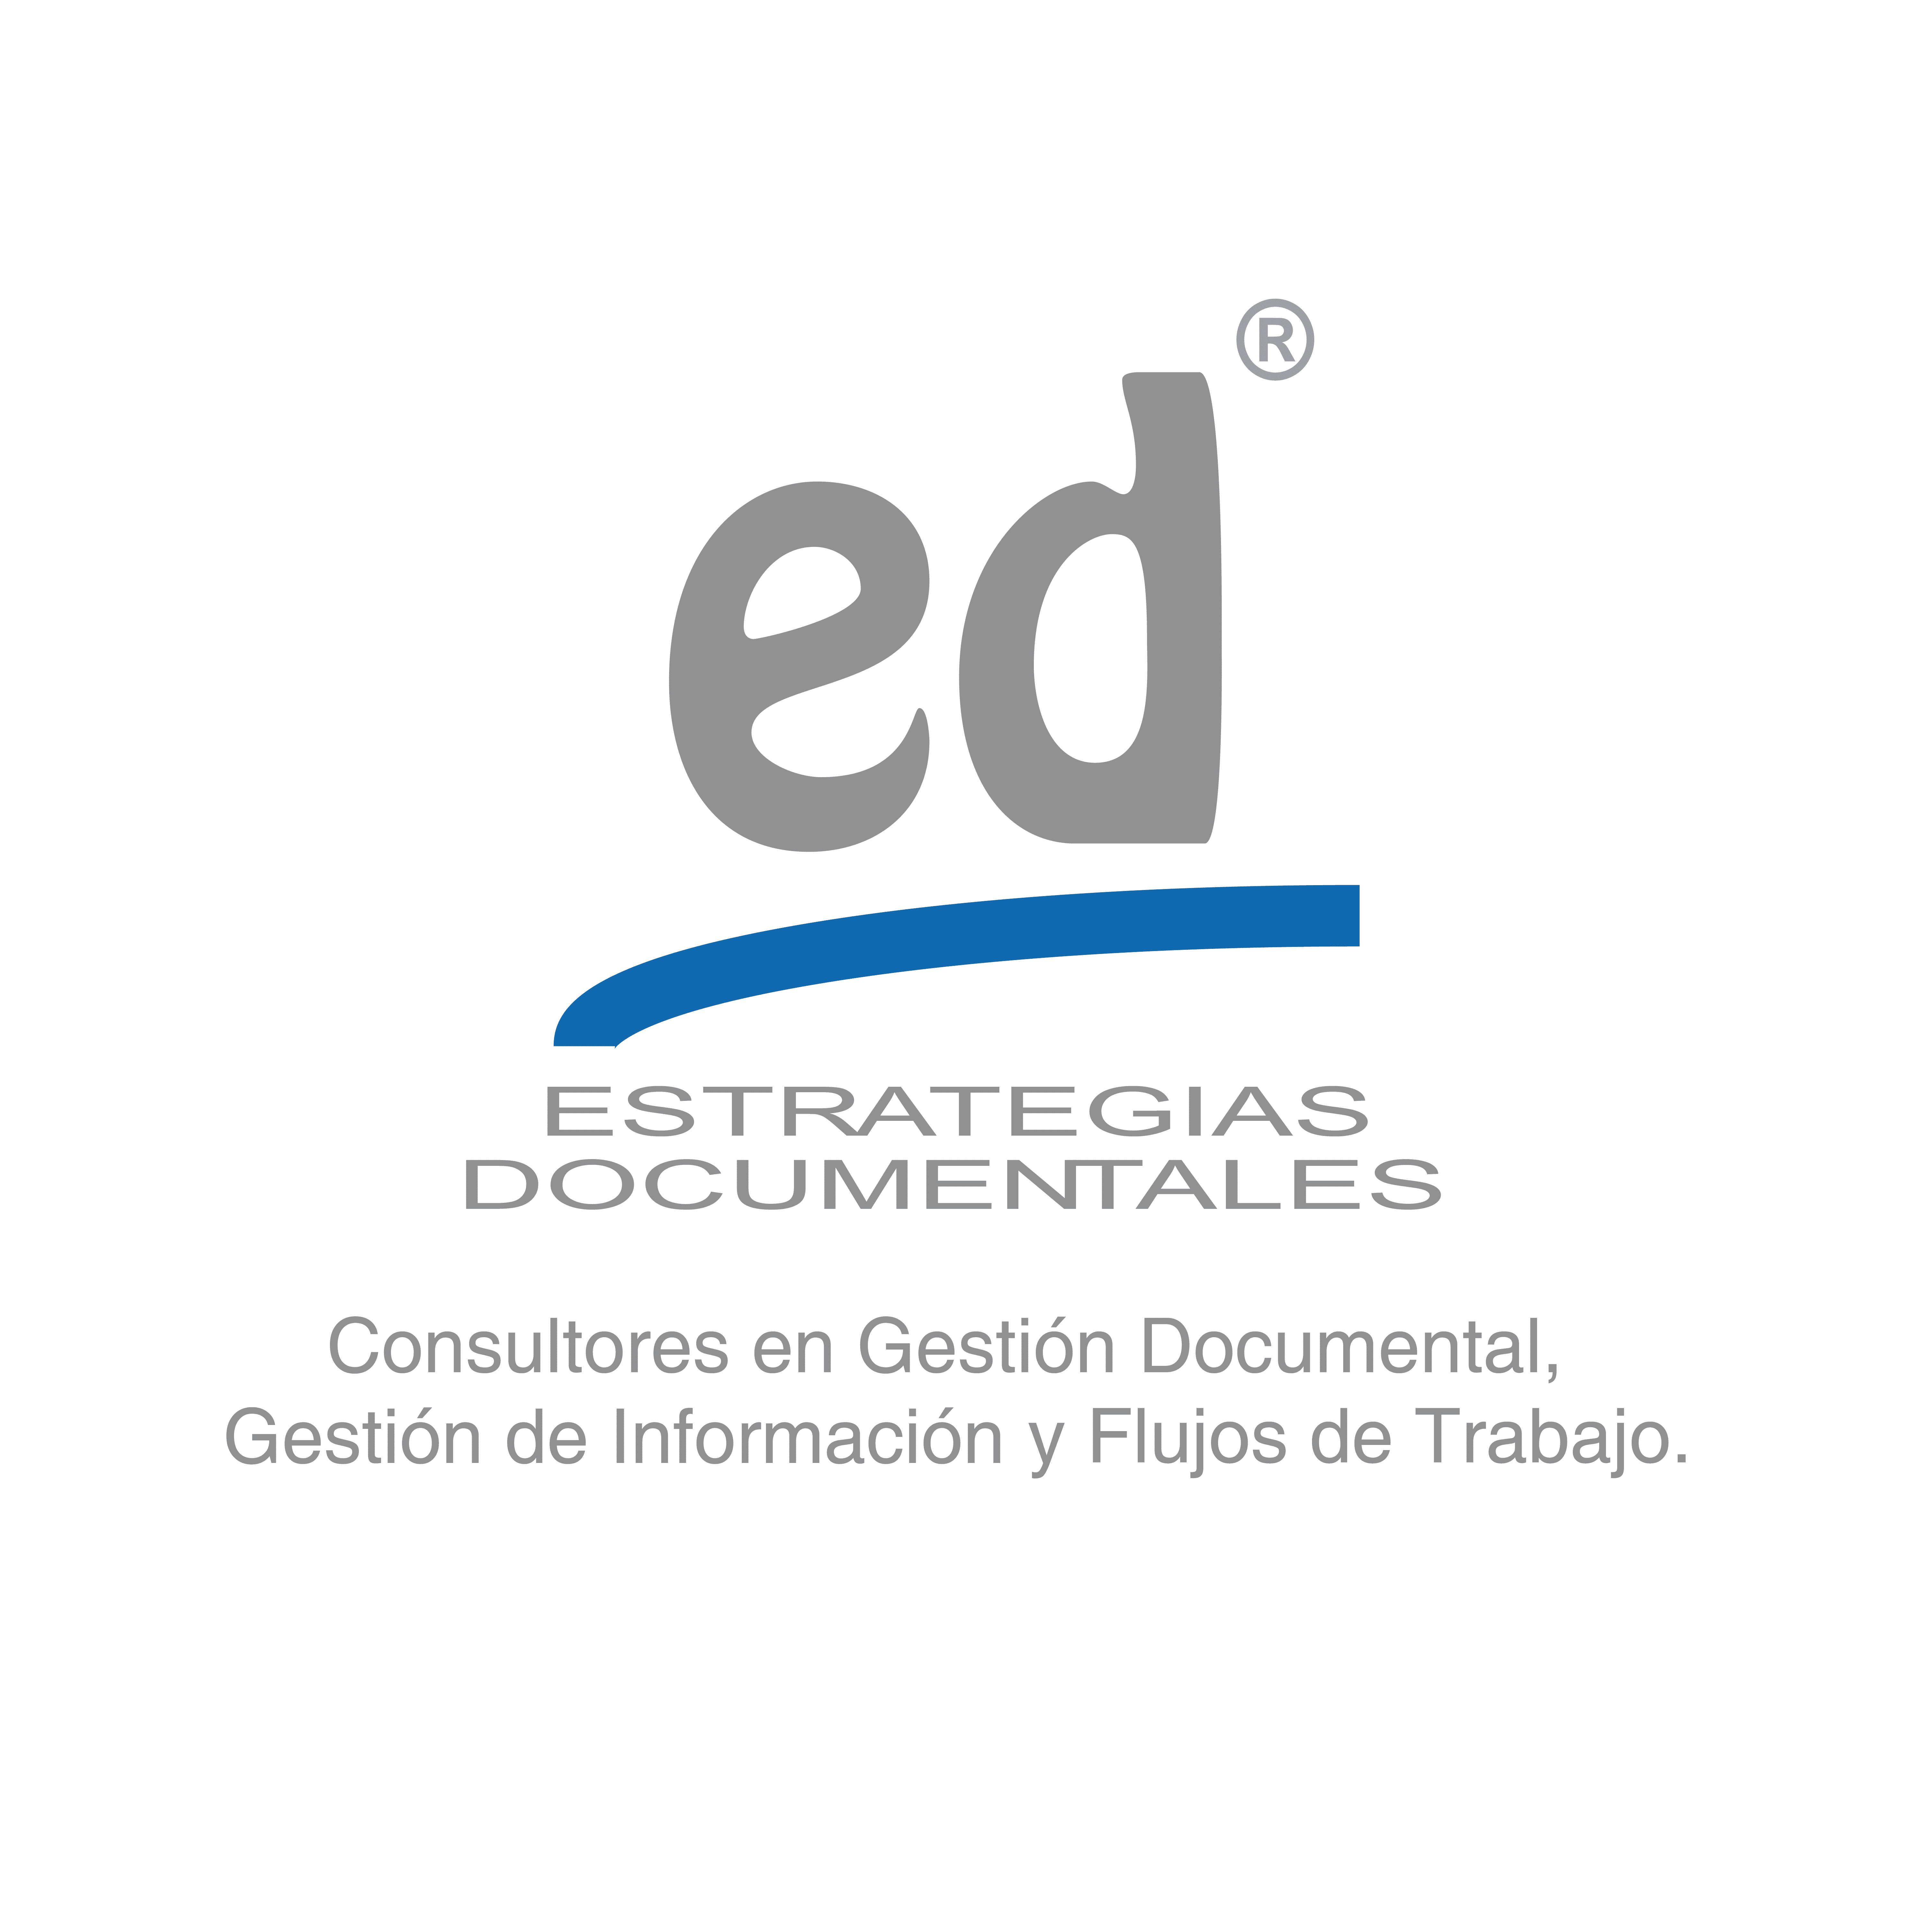 Estrategias Documentales S.A.S.